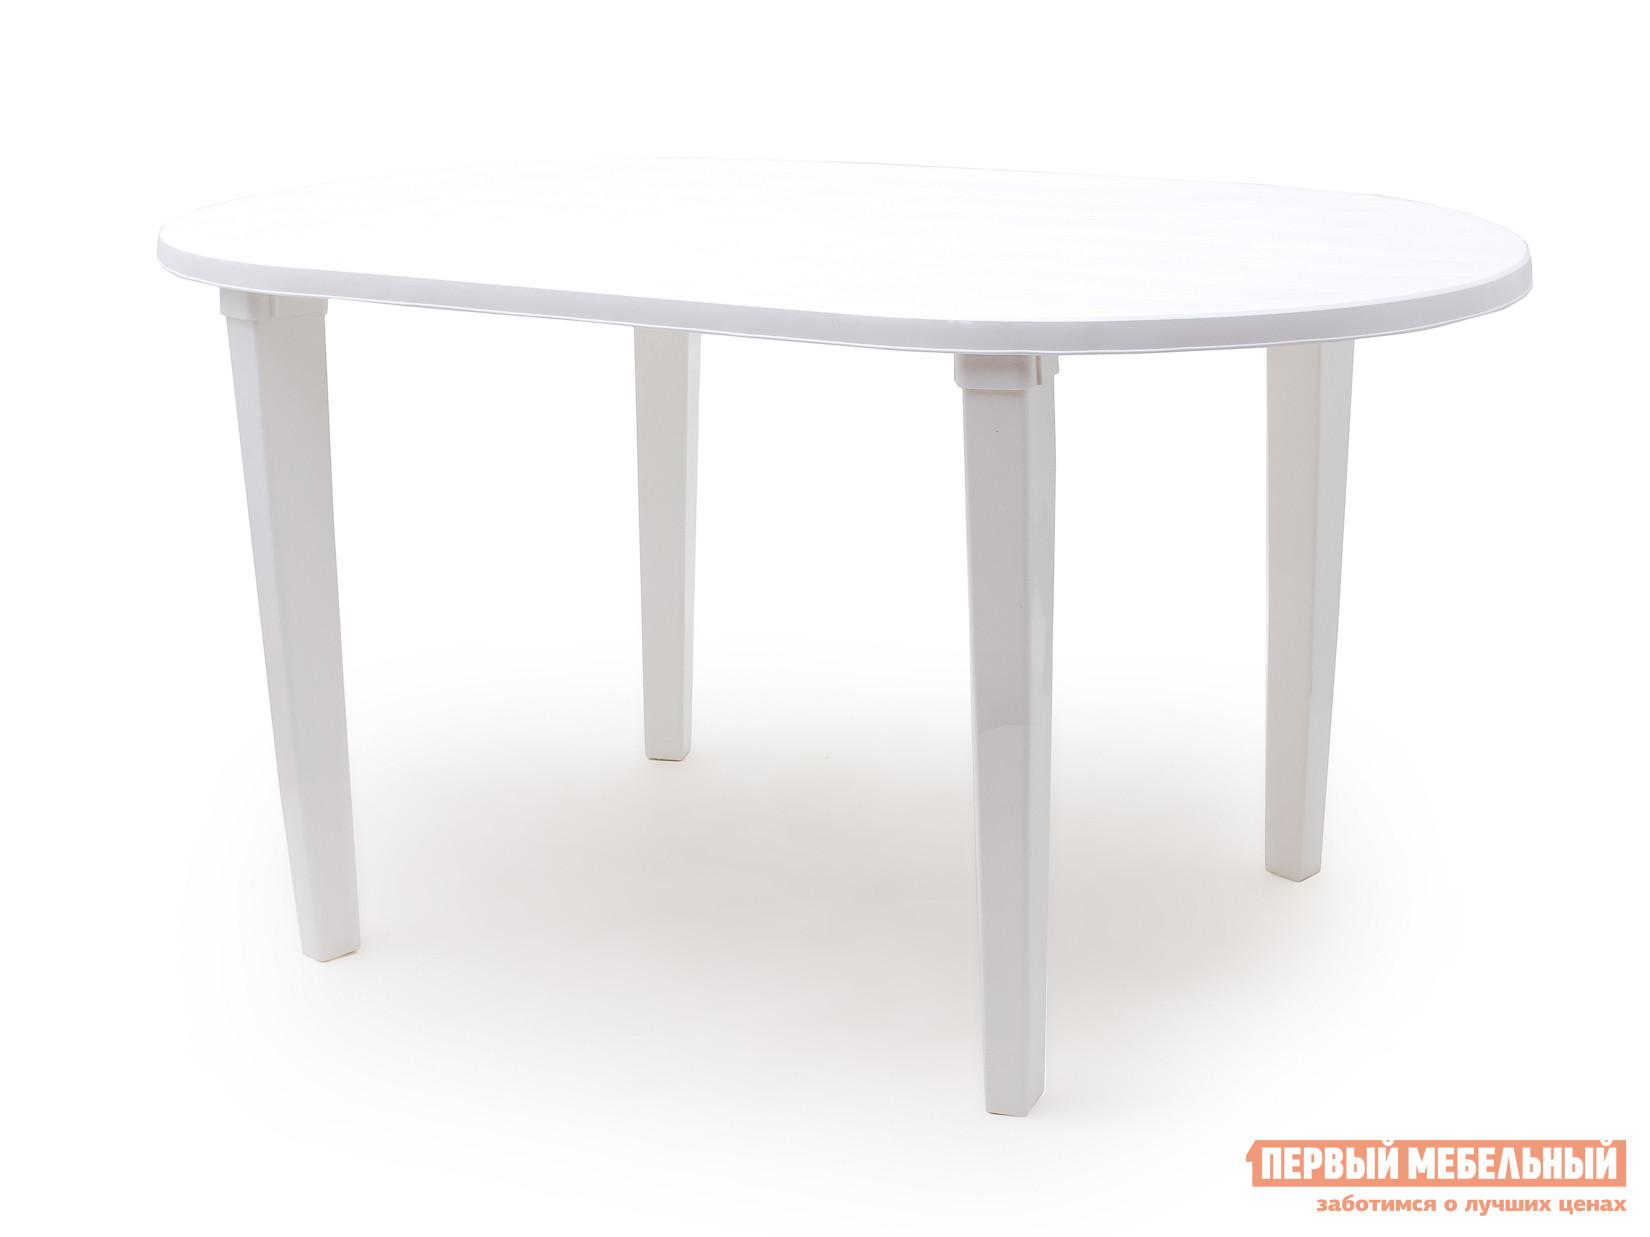 Пластиковый стол Стандарт Пластик Групп Стол овальный (1400х800х710) мм пьедестал овальный стандарт ст 2